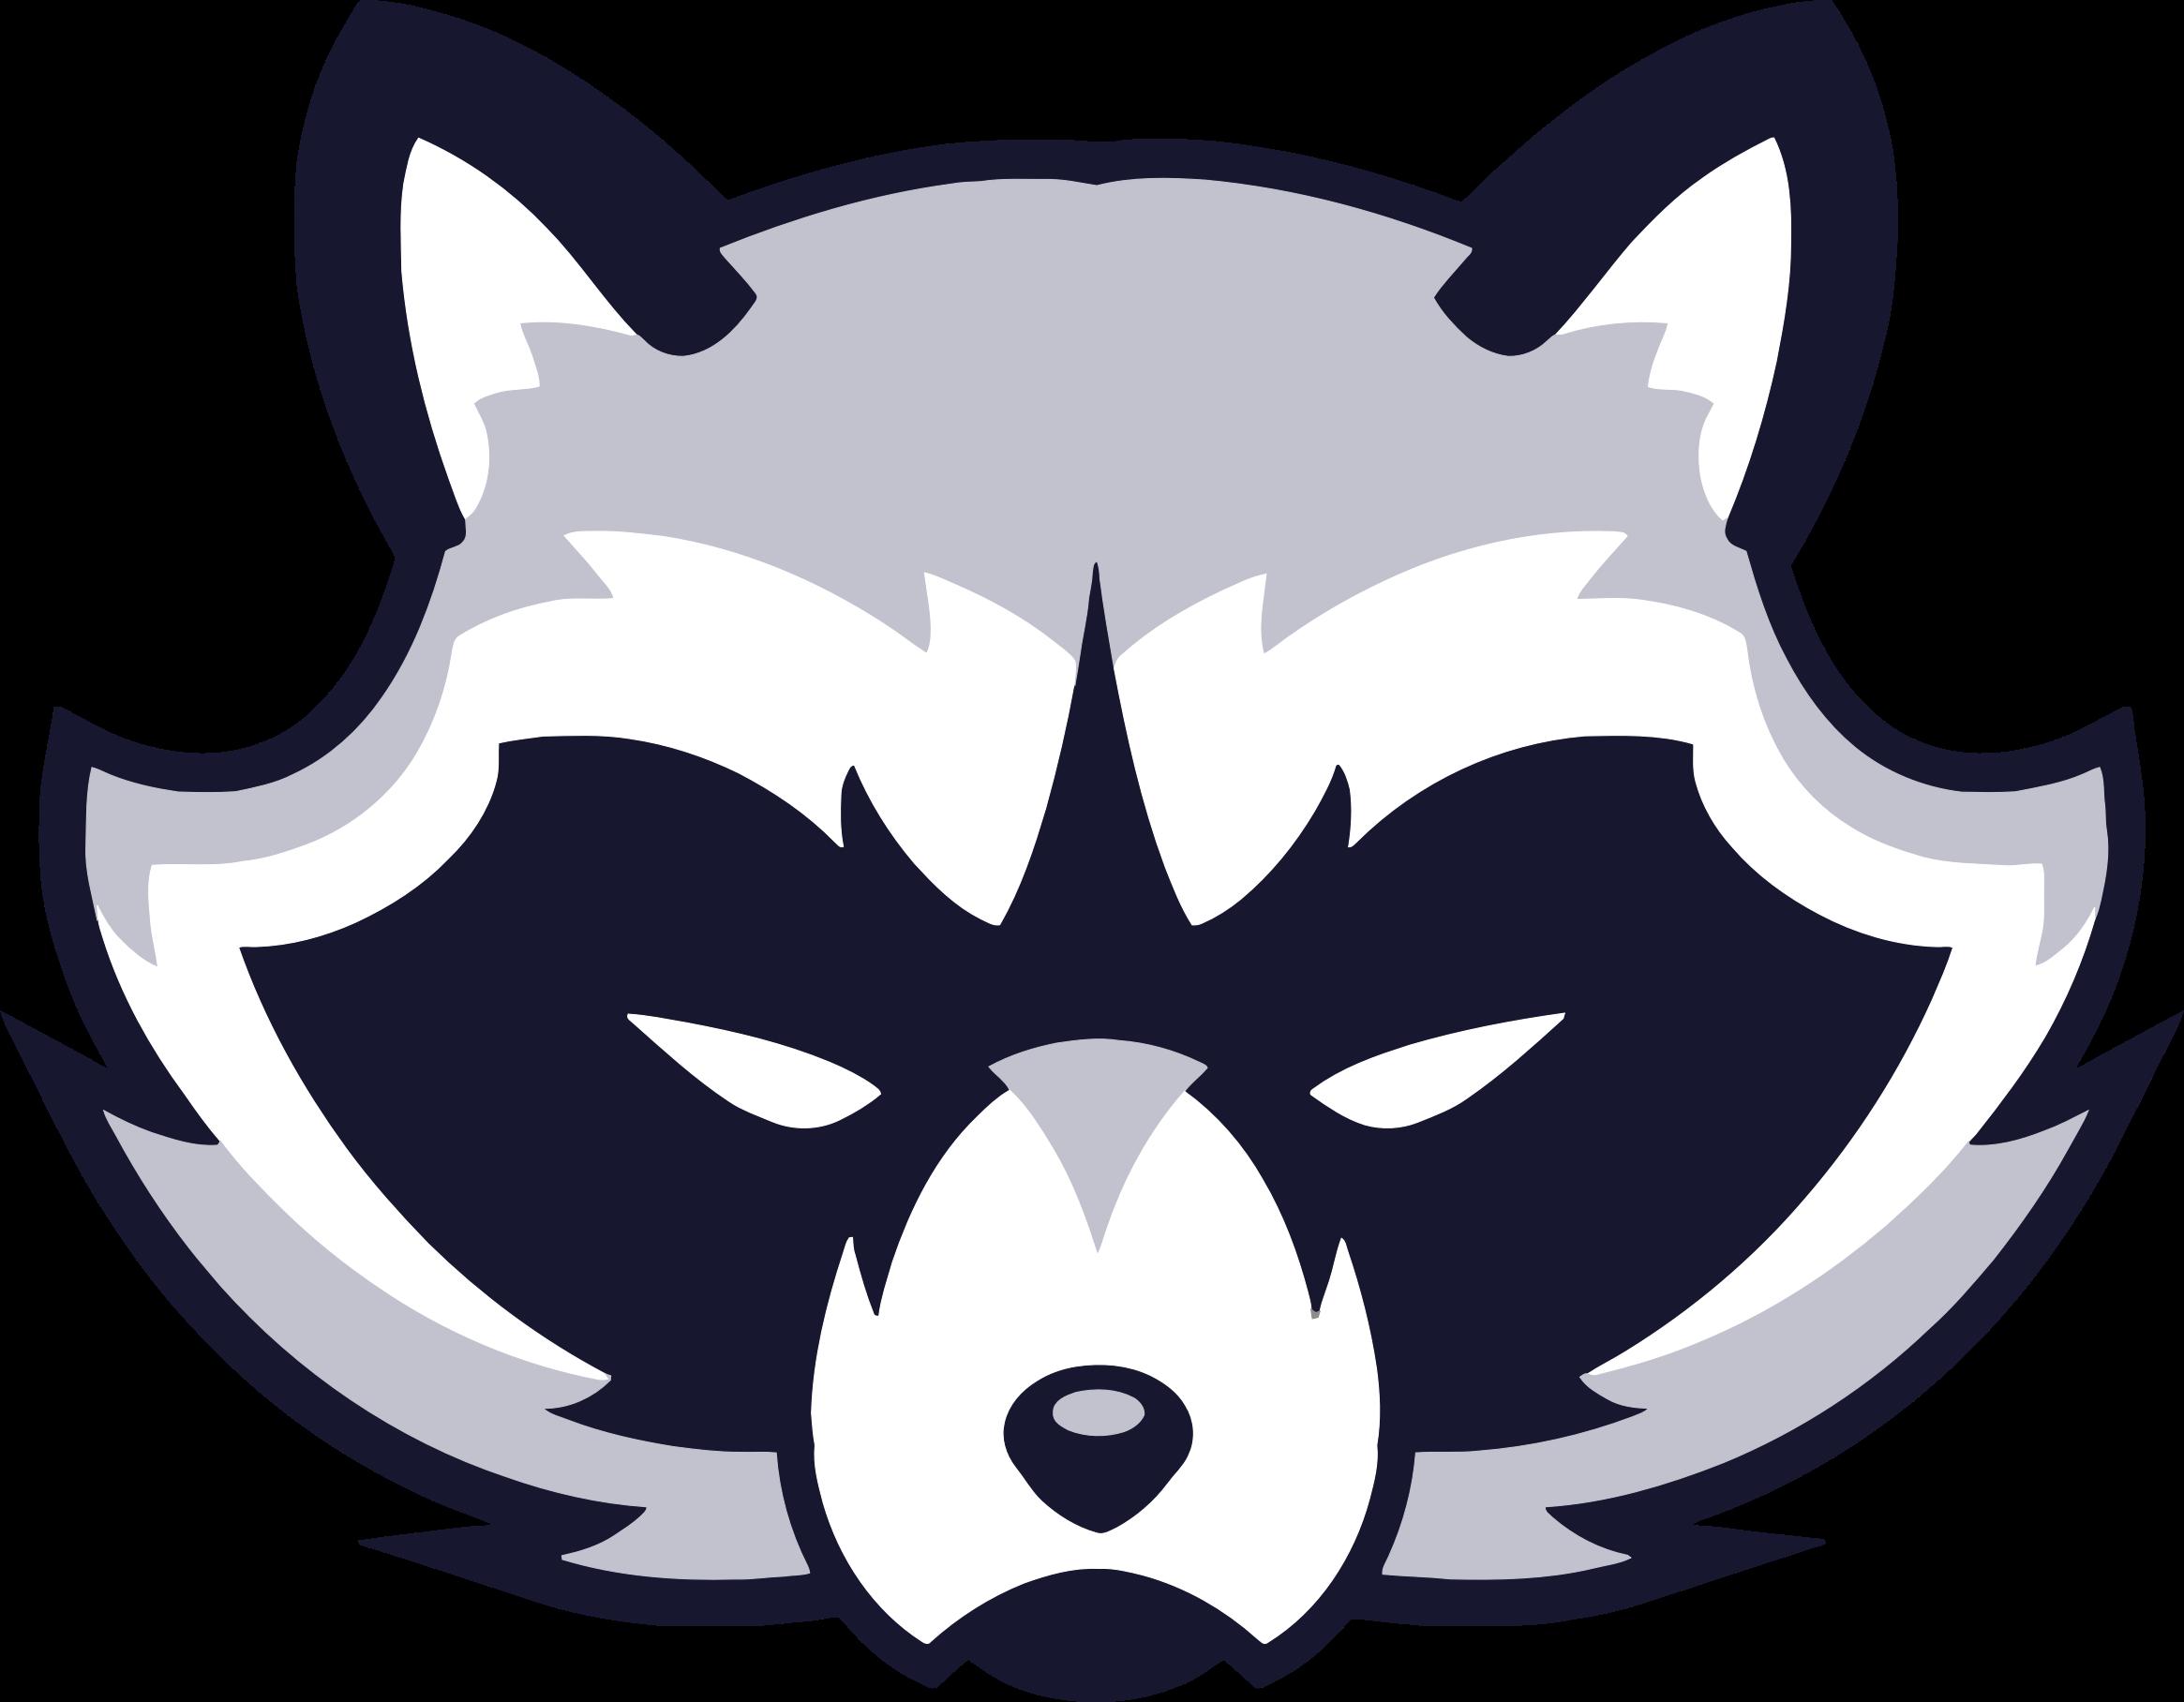 Clipart - Raccoon Face Logo Raccoon Face Clip Art